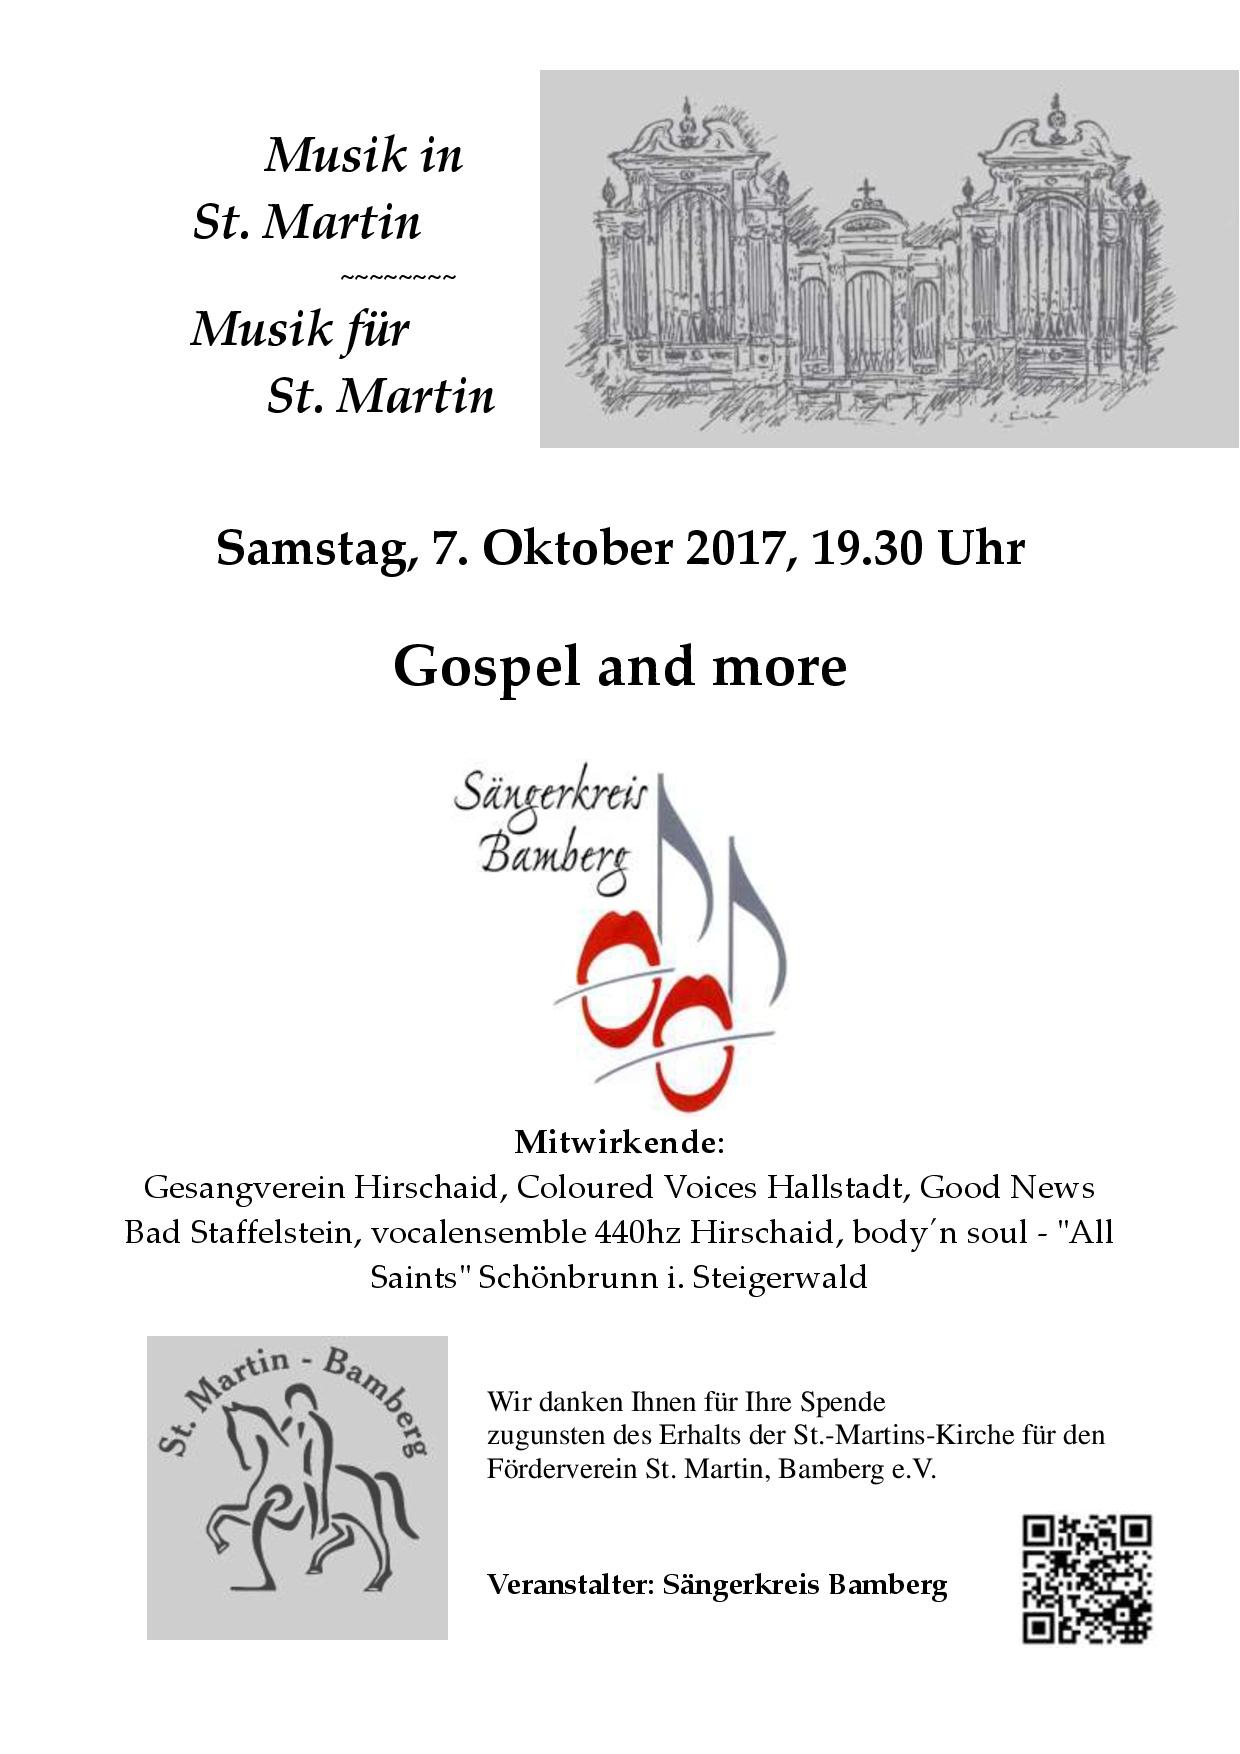 veranstaltung gospel and more  - bamberg - 07.10.2017, Einladung